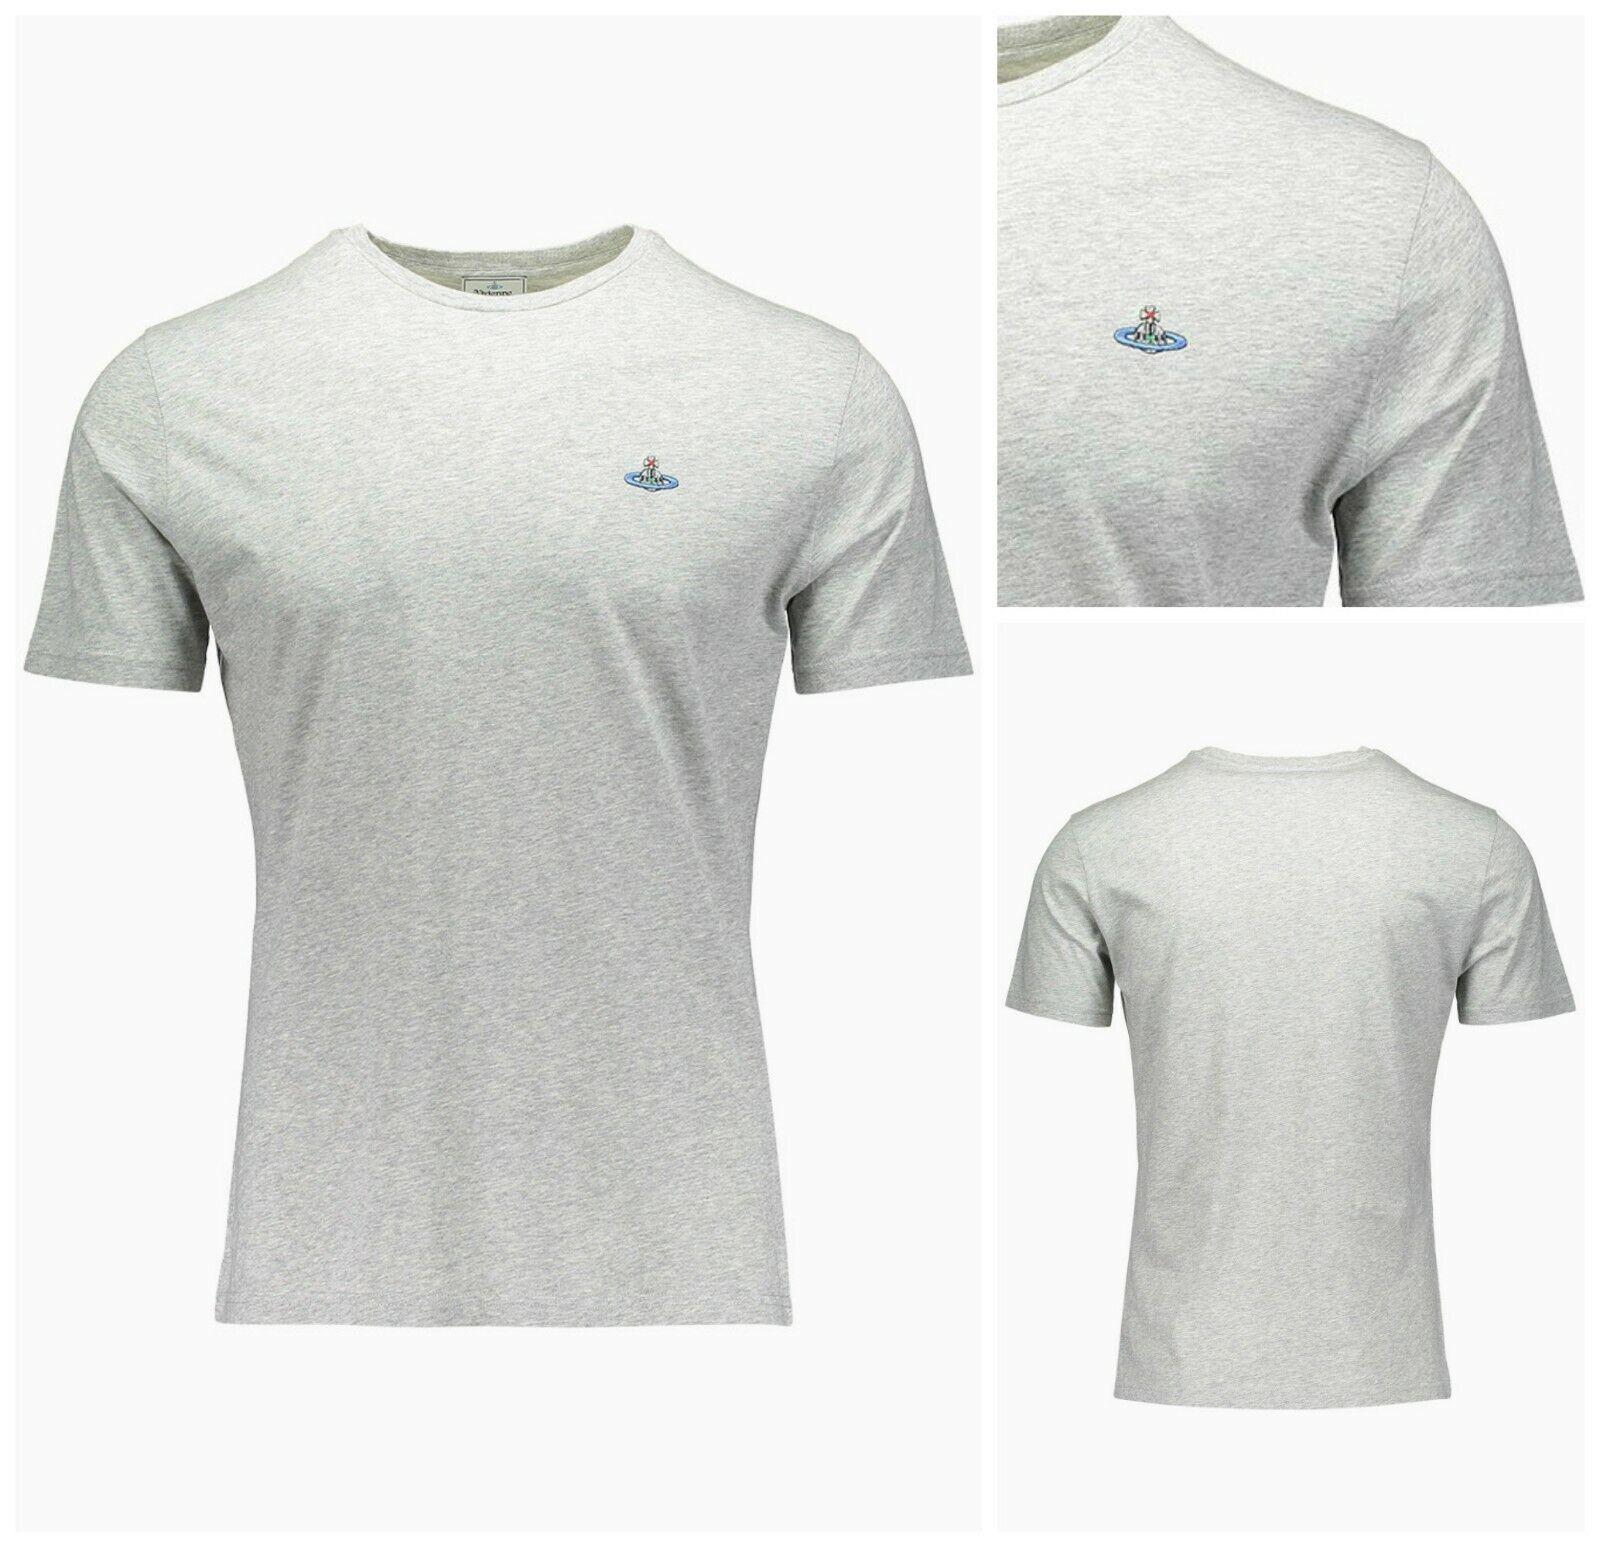 Authentic Vivienne Westwood Grigio T-Shirt. Girocollo Tee Regular Fit Cotone  T-Shirt. Grigio XXL b9b726 183854c64054